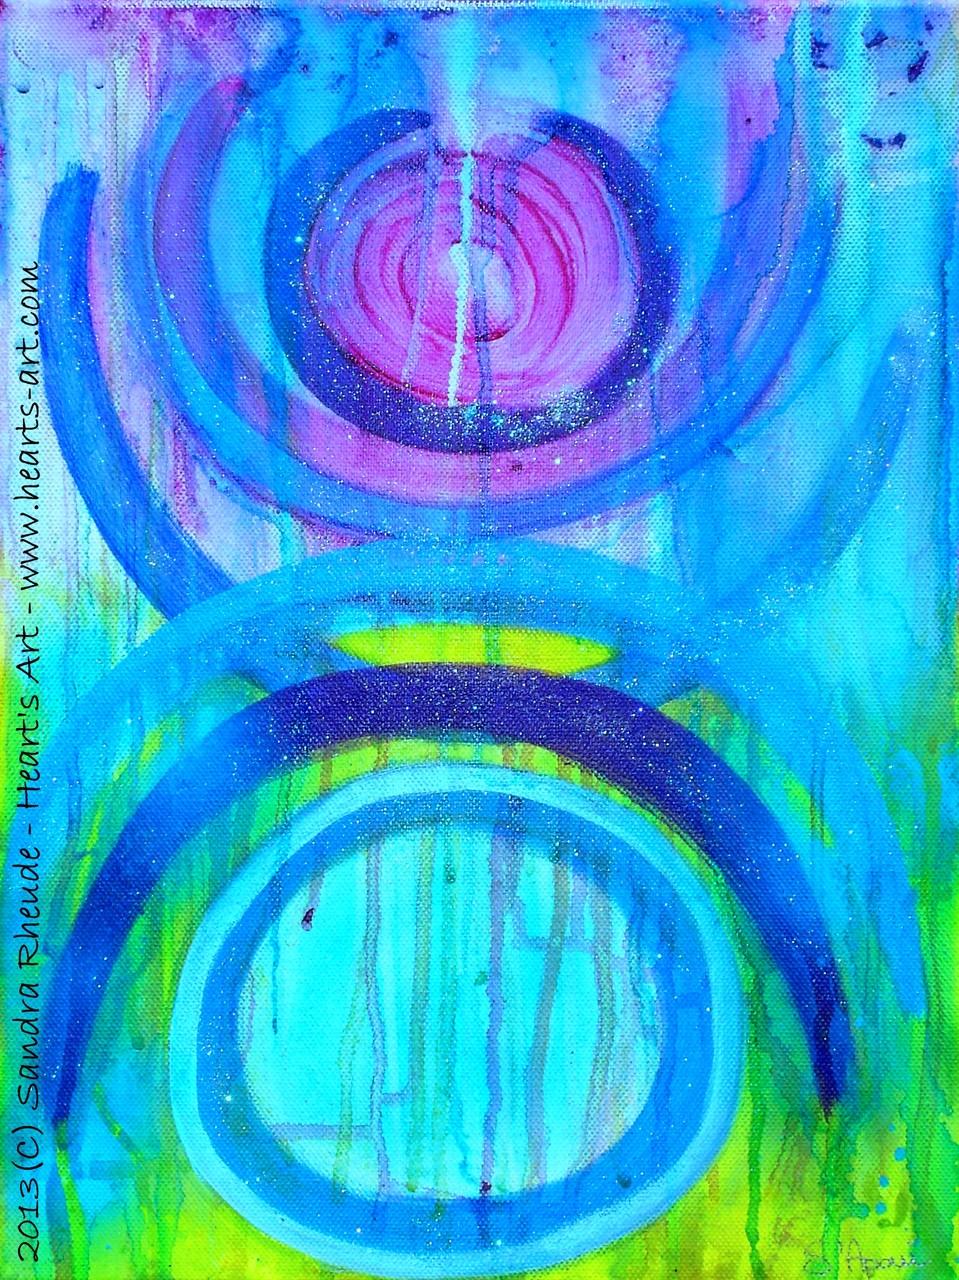 'Cheekiness' - 2013/37 - Acryl auf Leinwand - 30 x 40 cm - verkauft